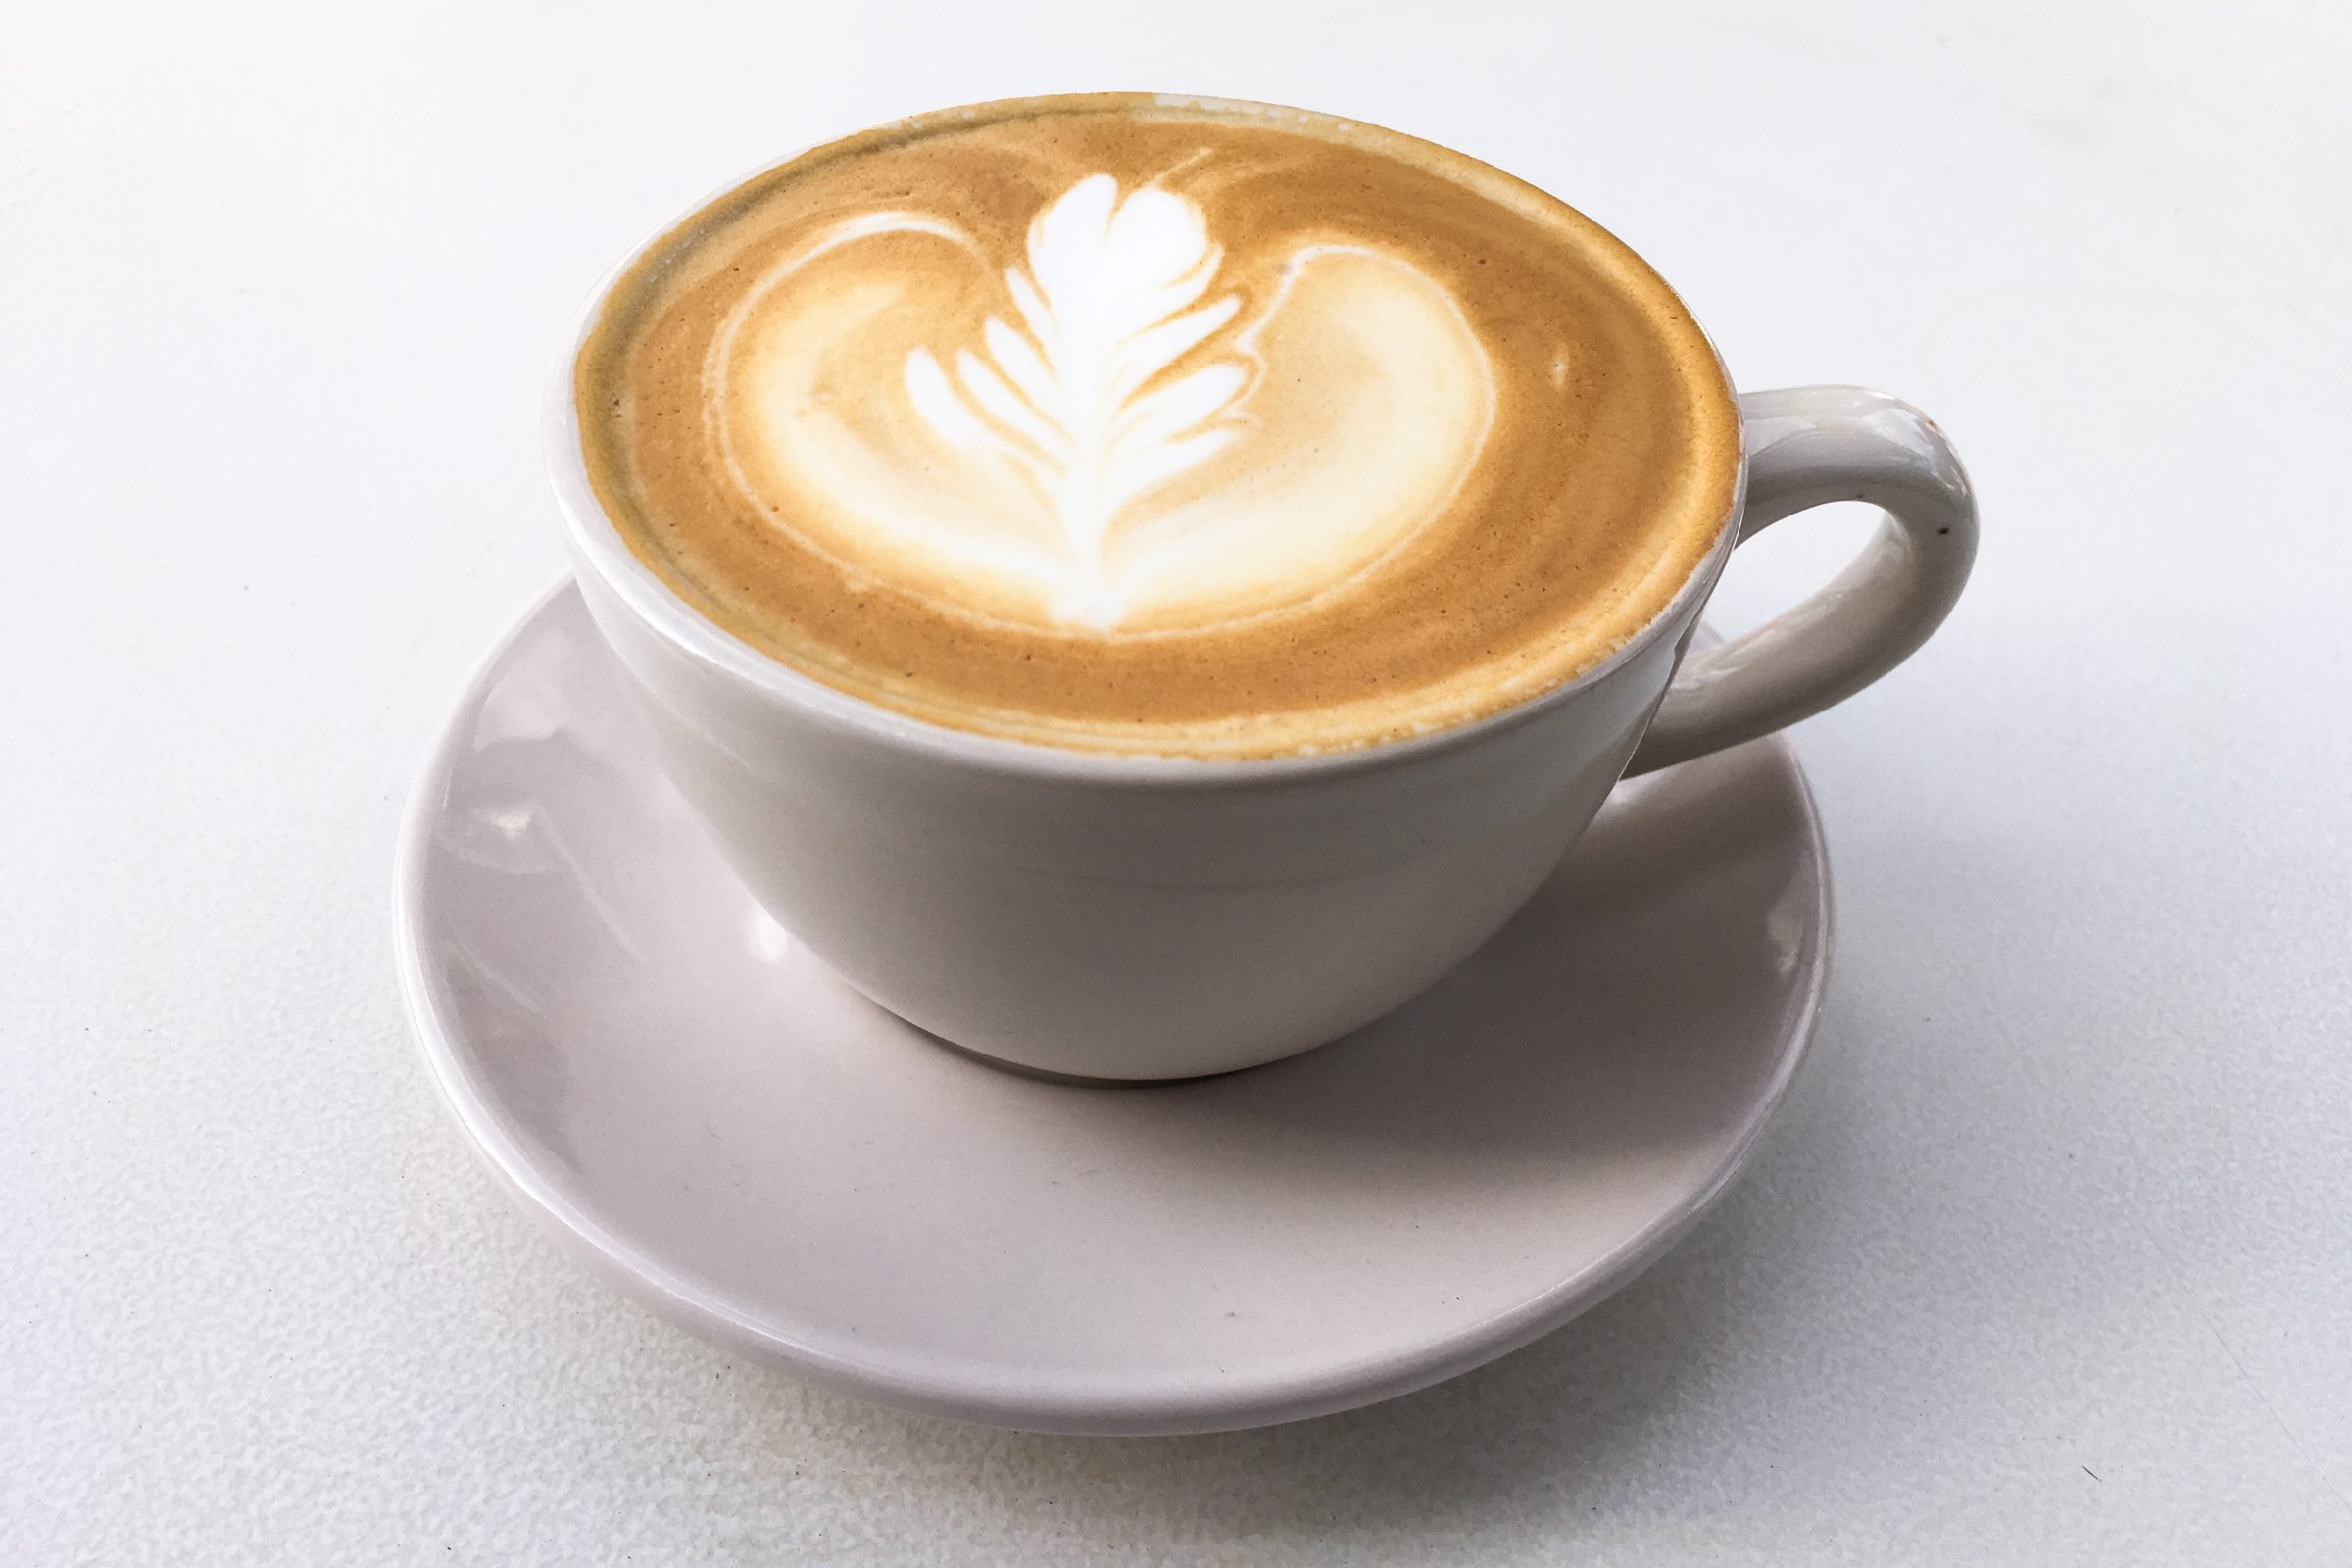 Leaf Latte Art In Coffee Cup